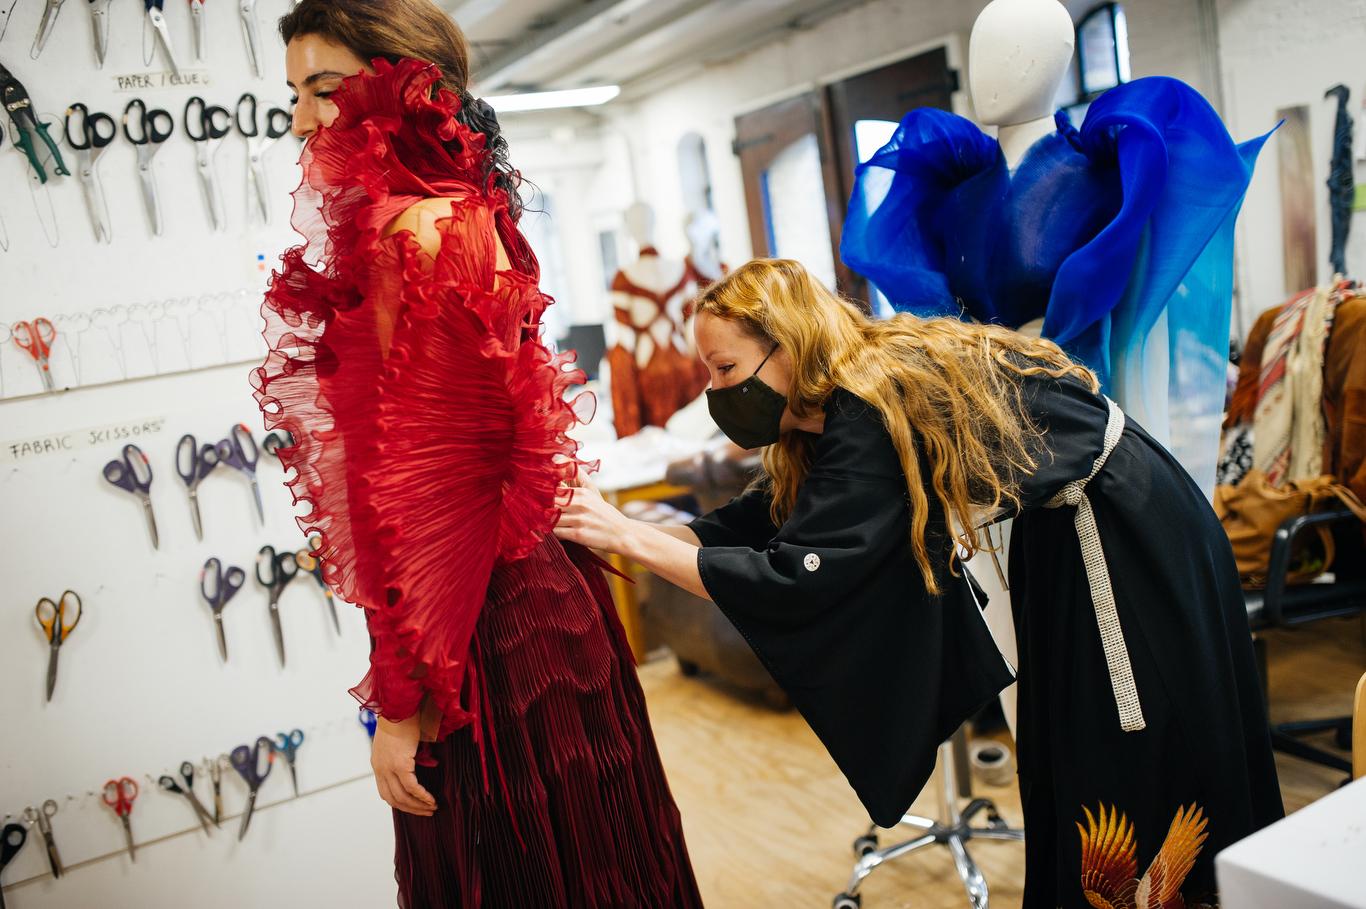 WWD's Kuba Dabrowski visits Iris Van Herpen's Amsterdam atelier during the fitting for Dutch-Iranian musician Sevdaliza.